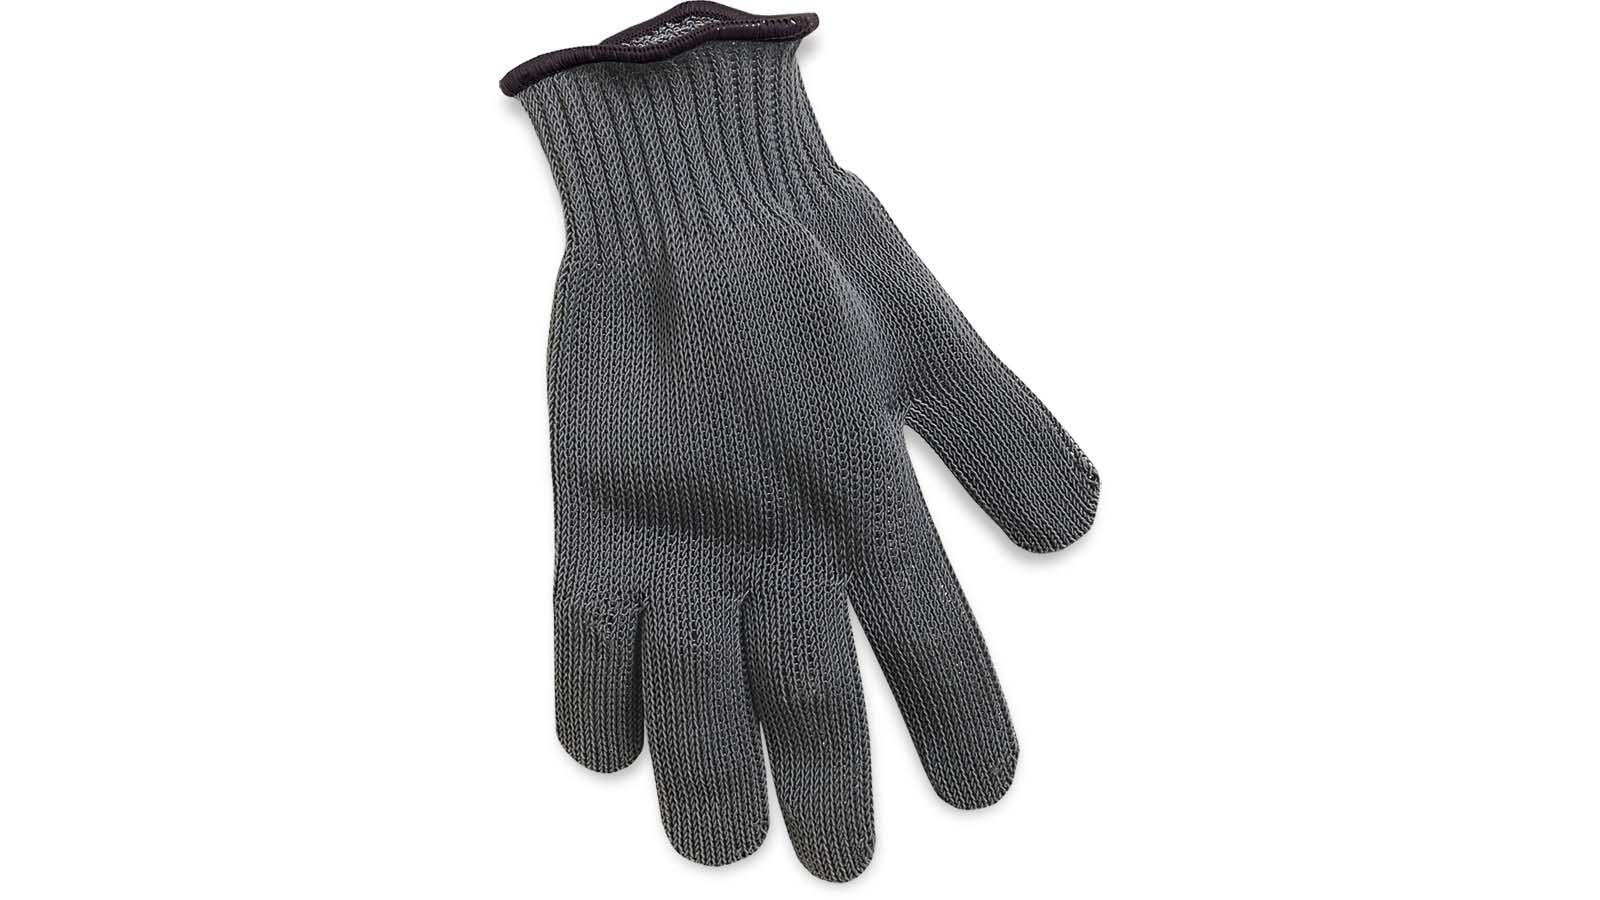 Rapala BPFGL Tuff-Knit Fillet Glove - Large